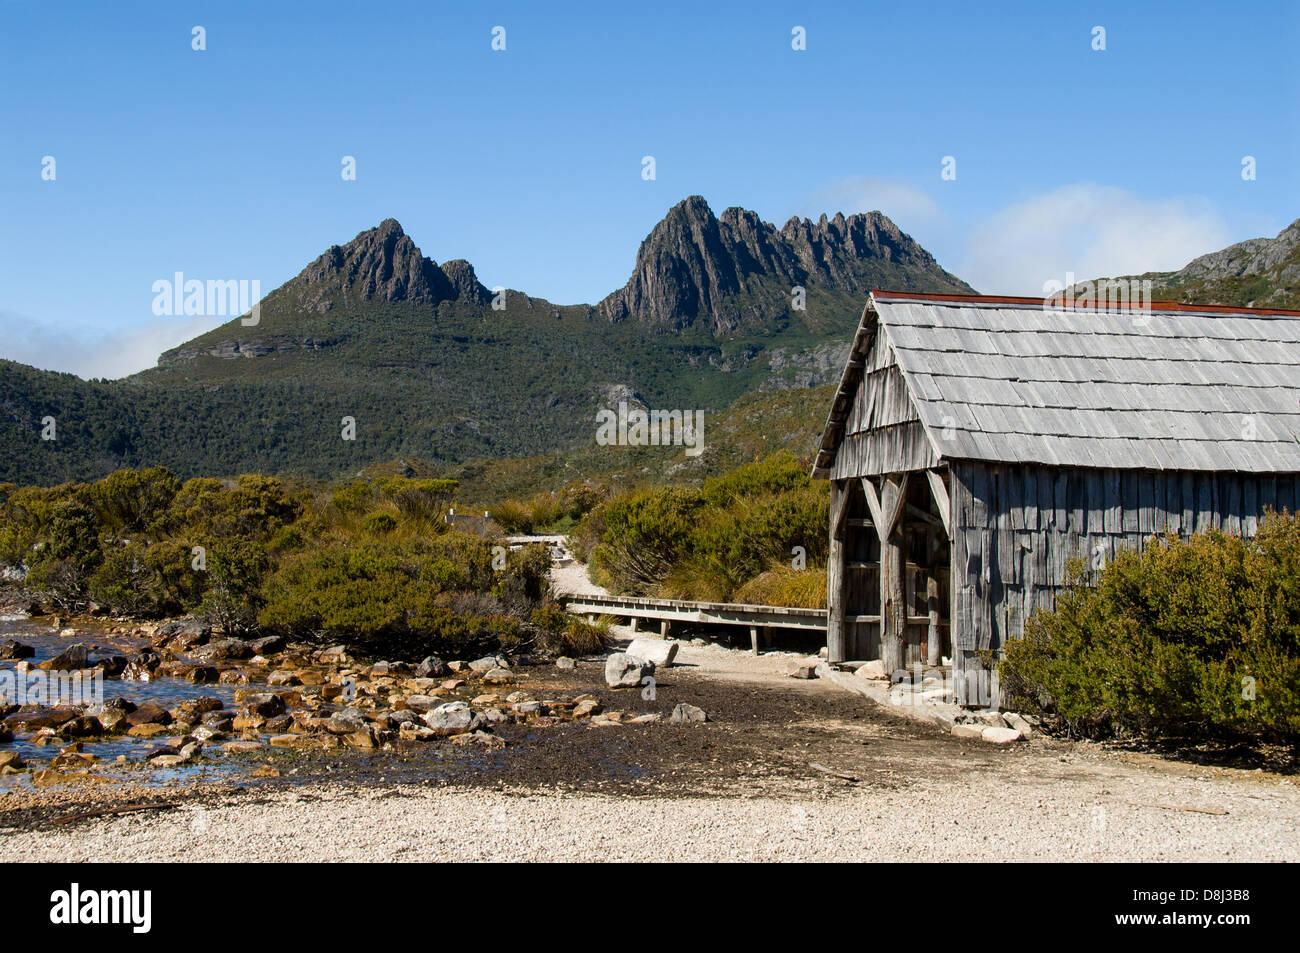 Fishing Hut on Dove Lake, Cradle Mountain National Park, Tasmania, Australia - Stock Image